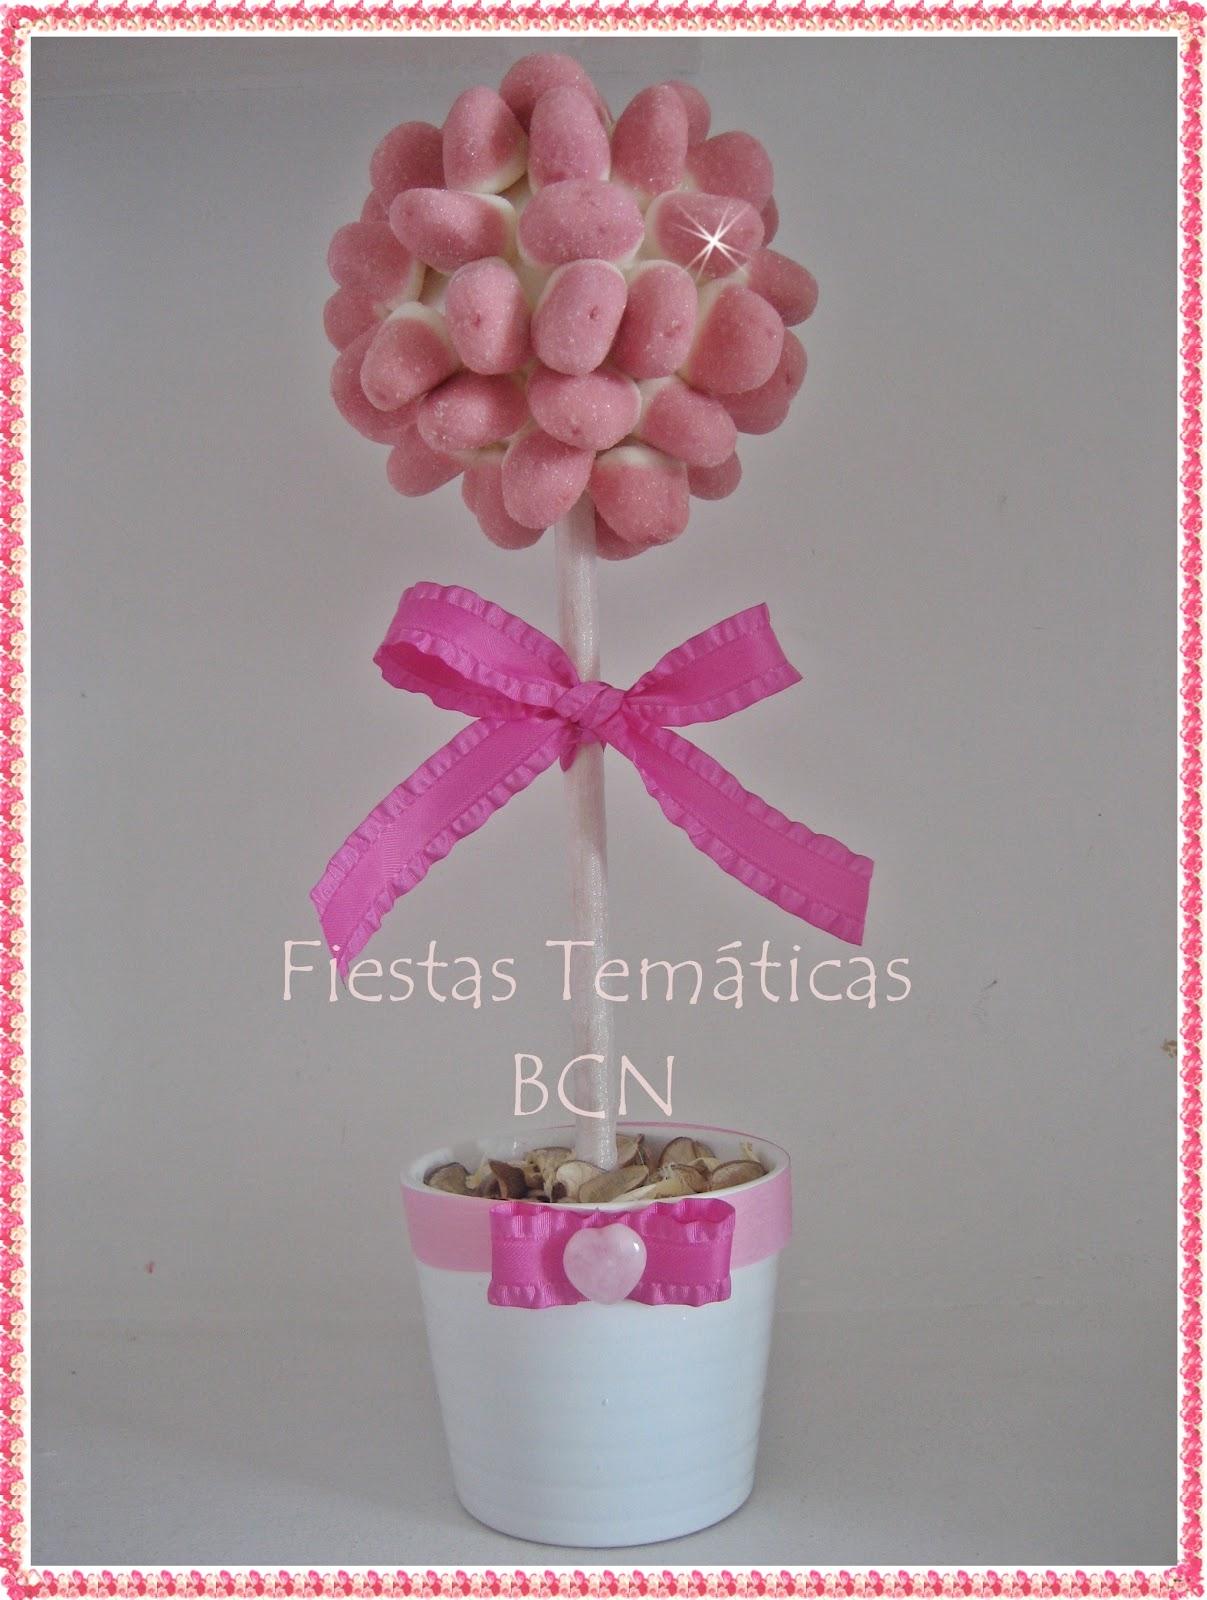 Fiestas tem ticas bcn kits de fiesta imprimibles cumple for Fiestas tematicas bcn